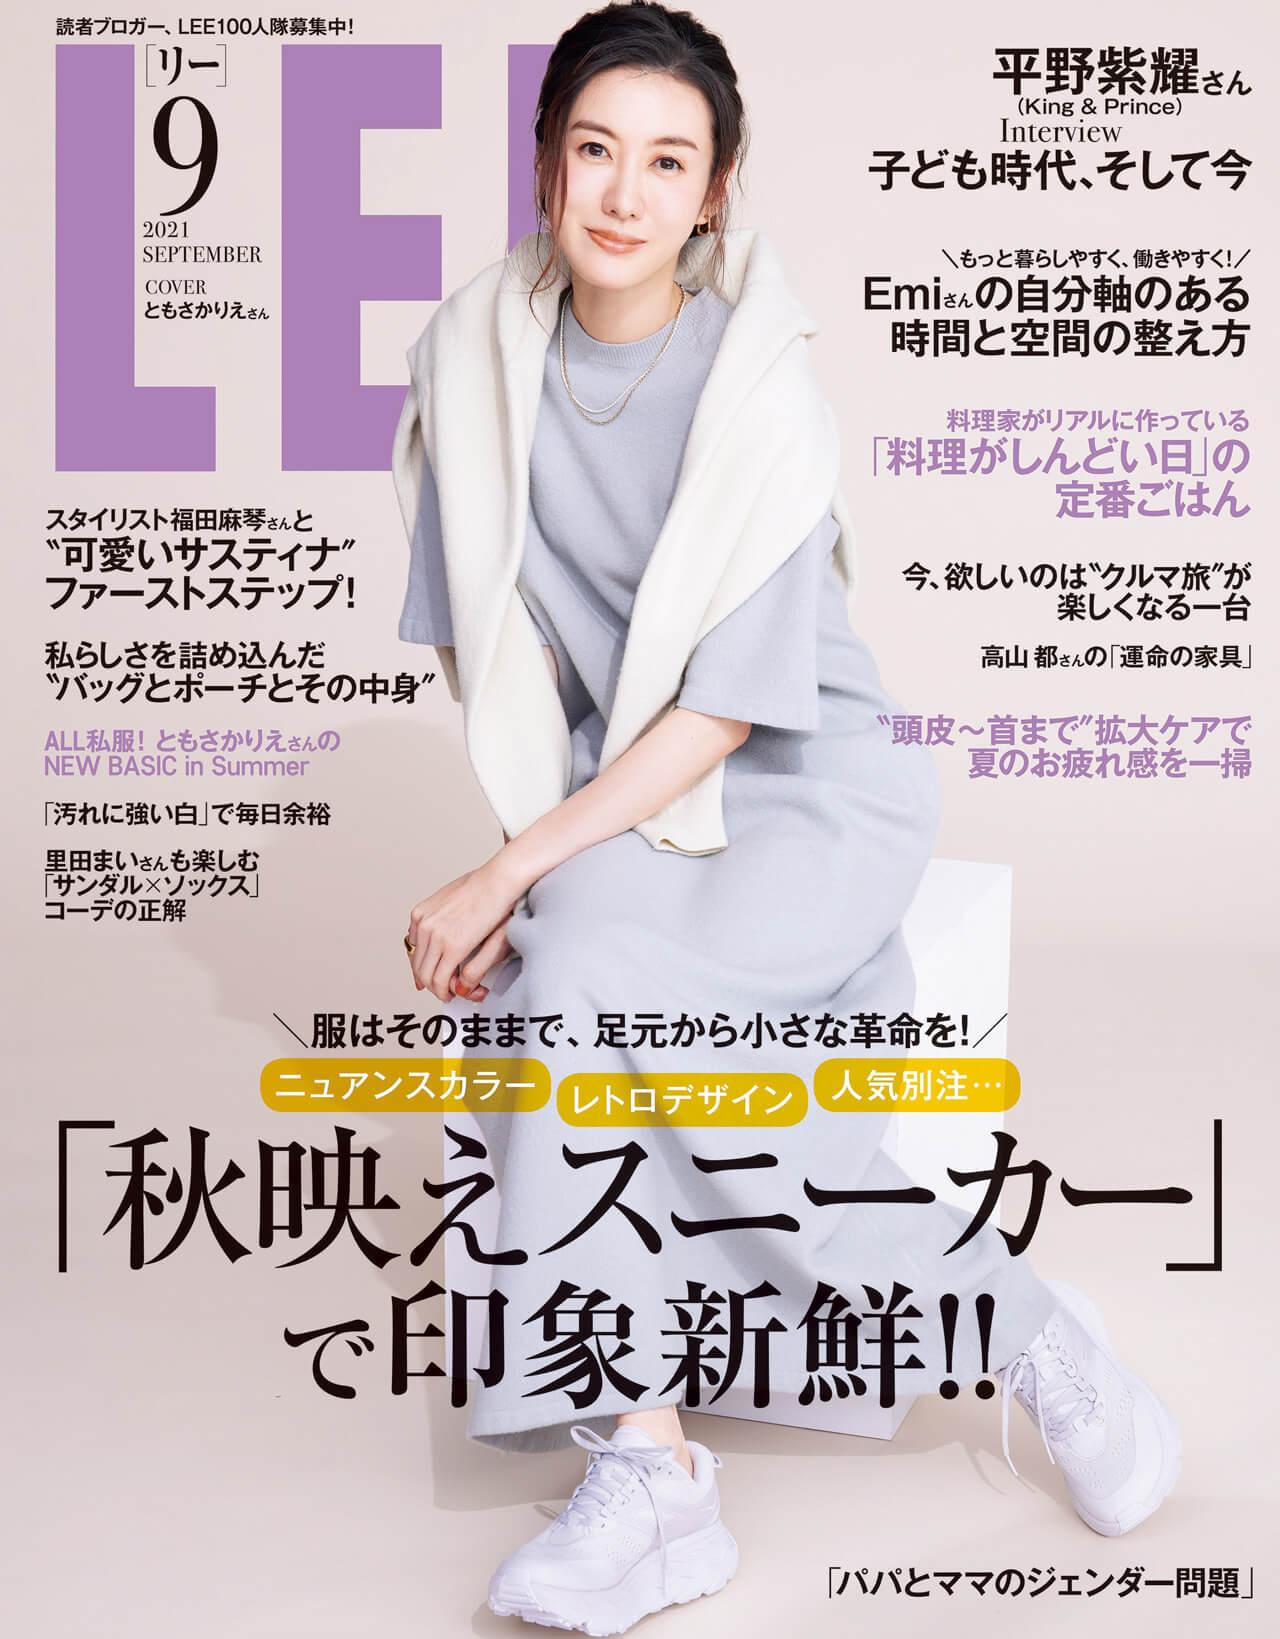 LEE2021年9月号通常版 ともさかりえさん表紙